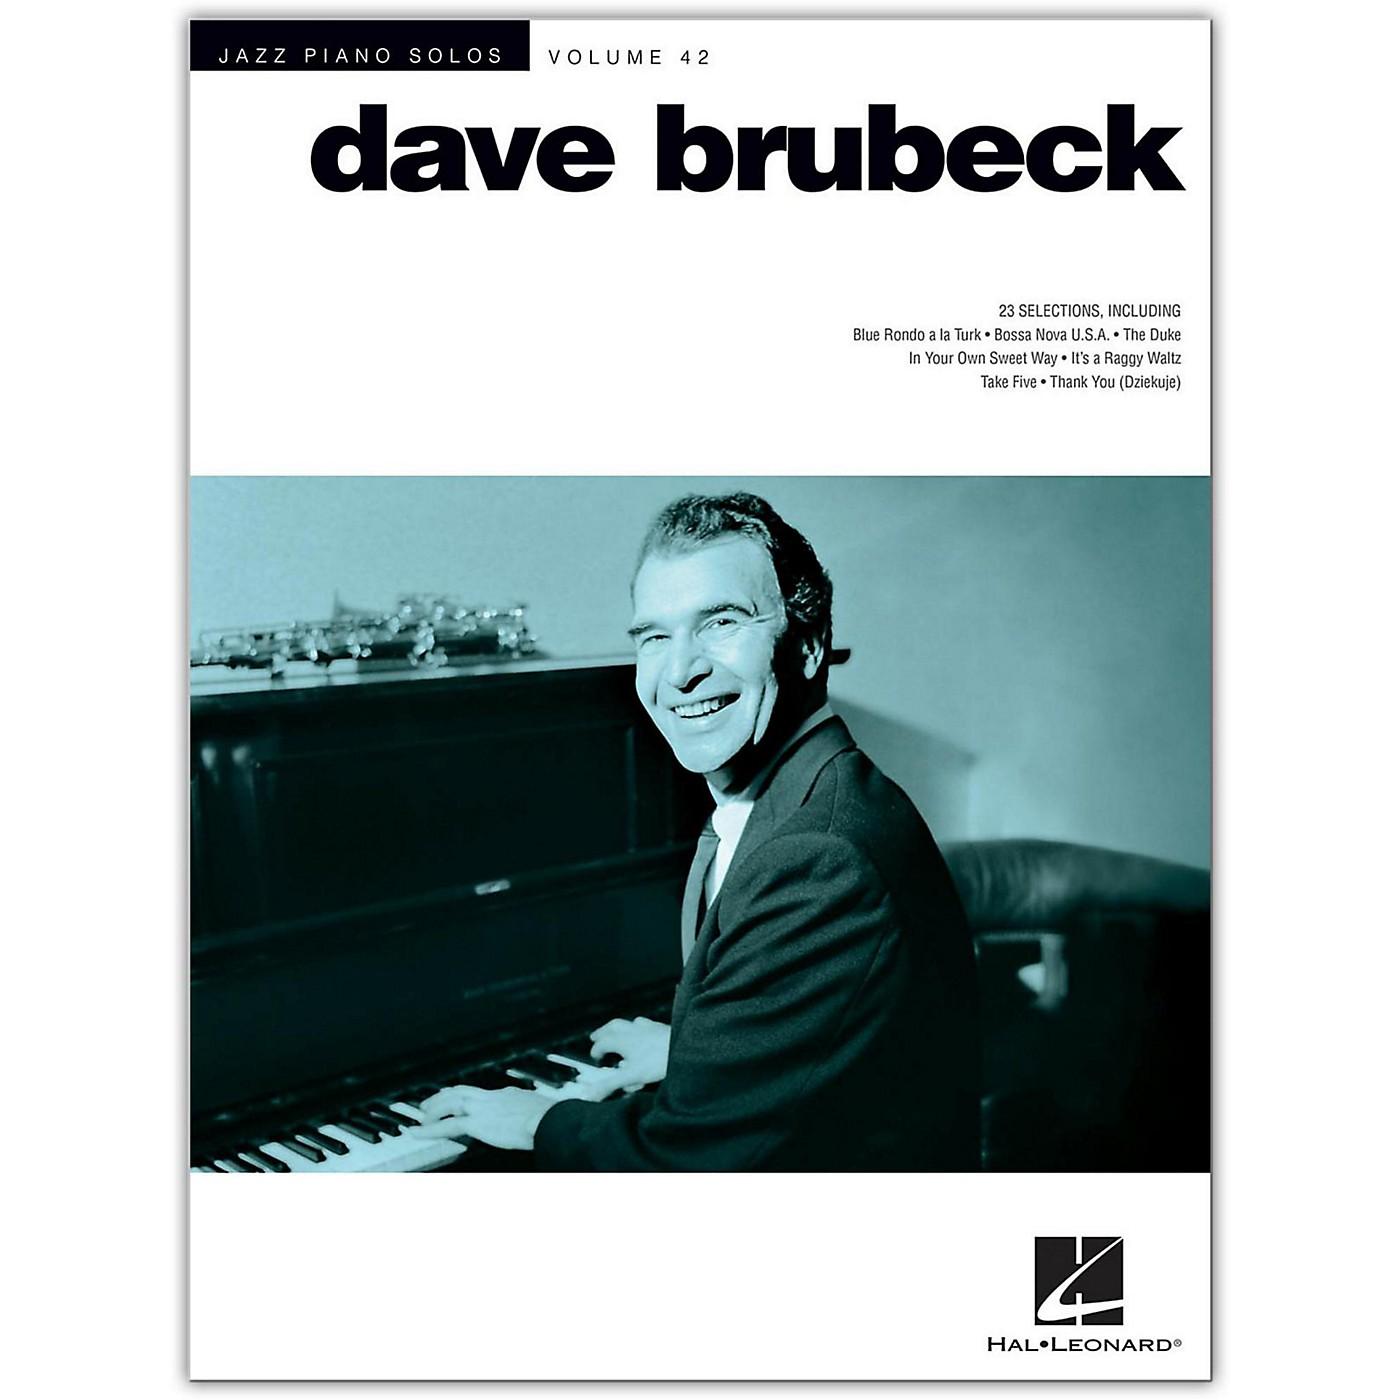 Hal Leonard Dave Brubeck - Jazz Piano Solos Volume 42 thumbnail